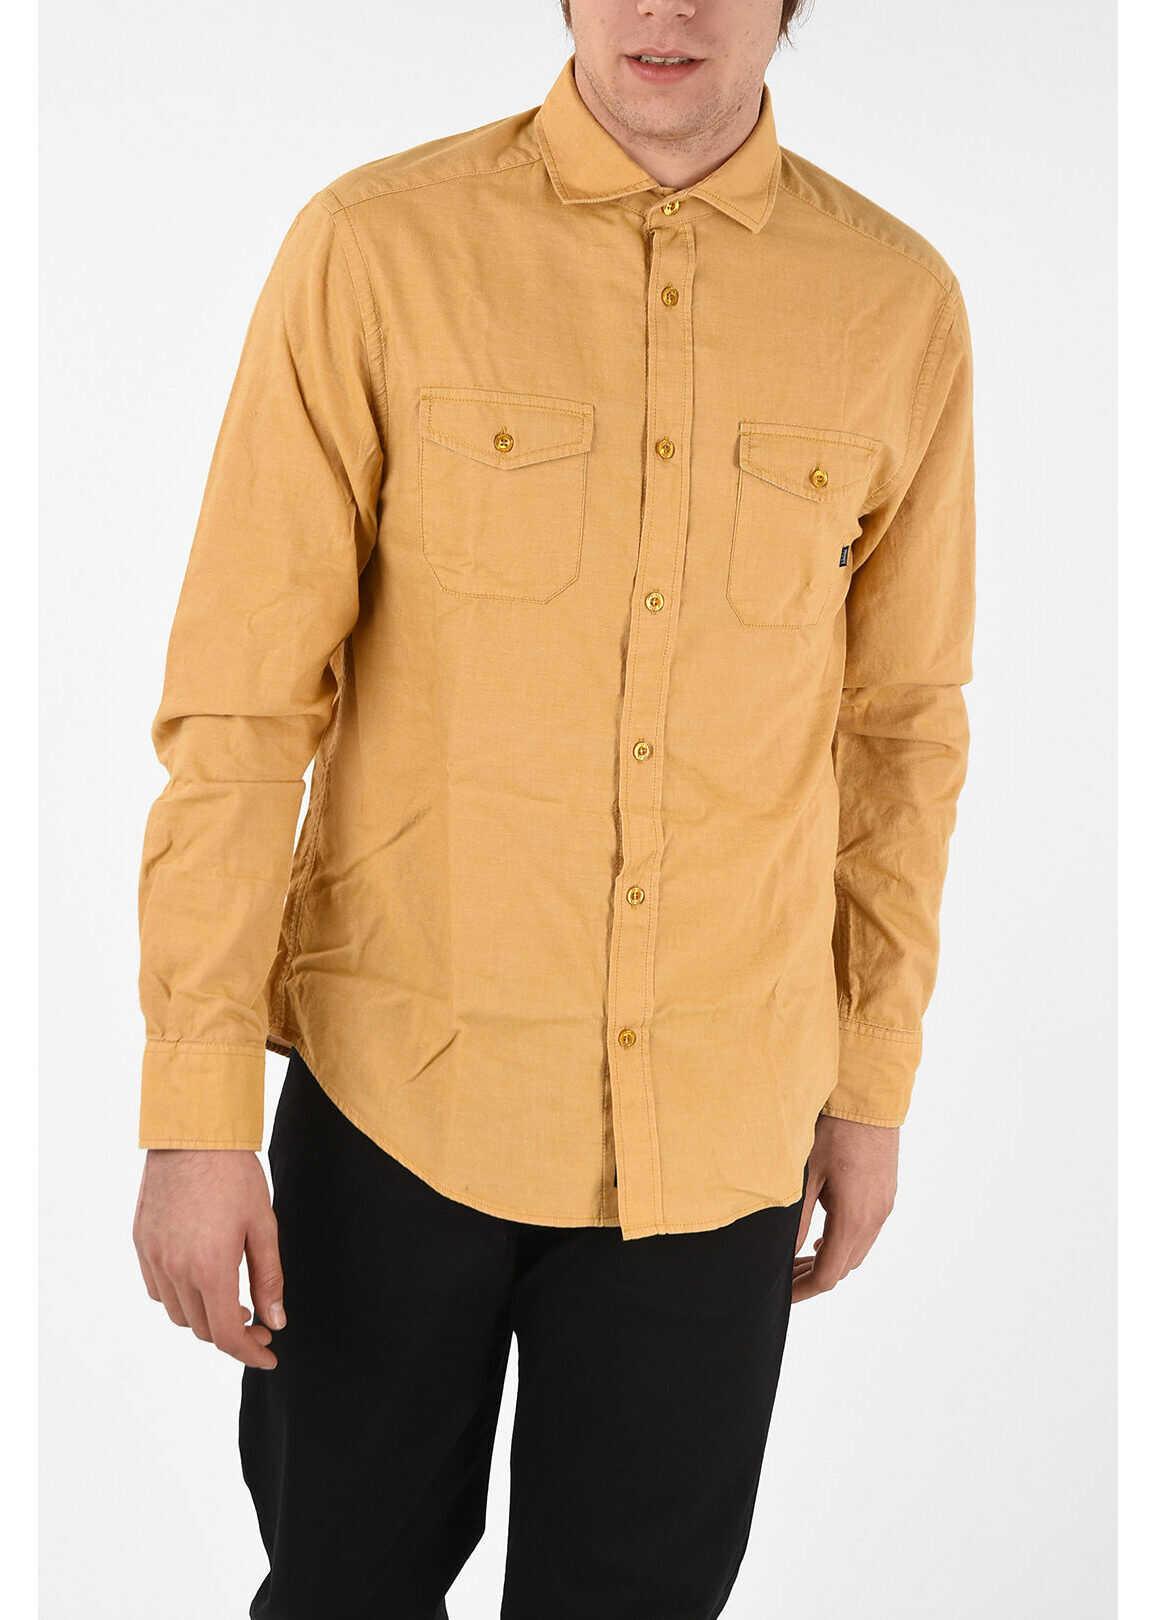 Armani ARMANI JEANS Spread Collar Custom Fit Shirt YELLOW imagine